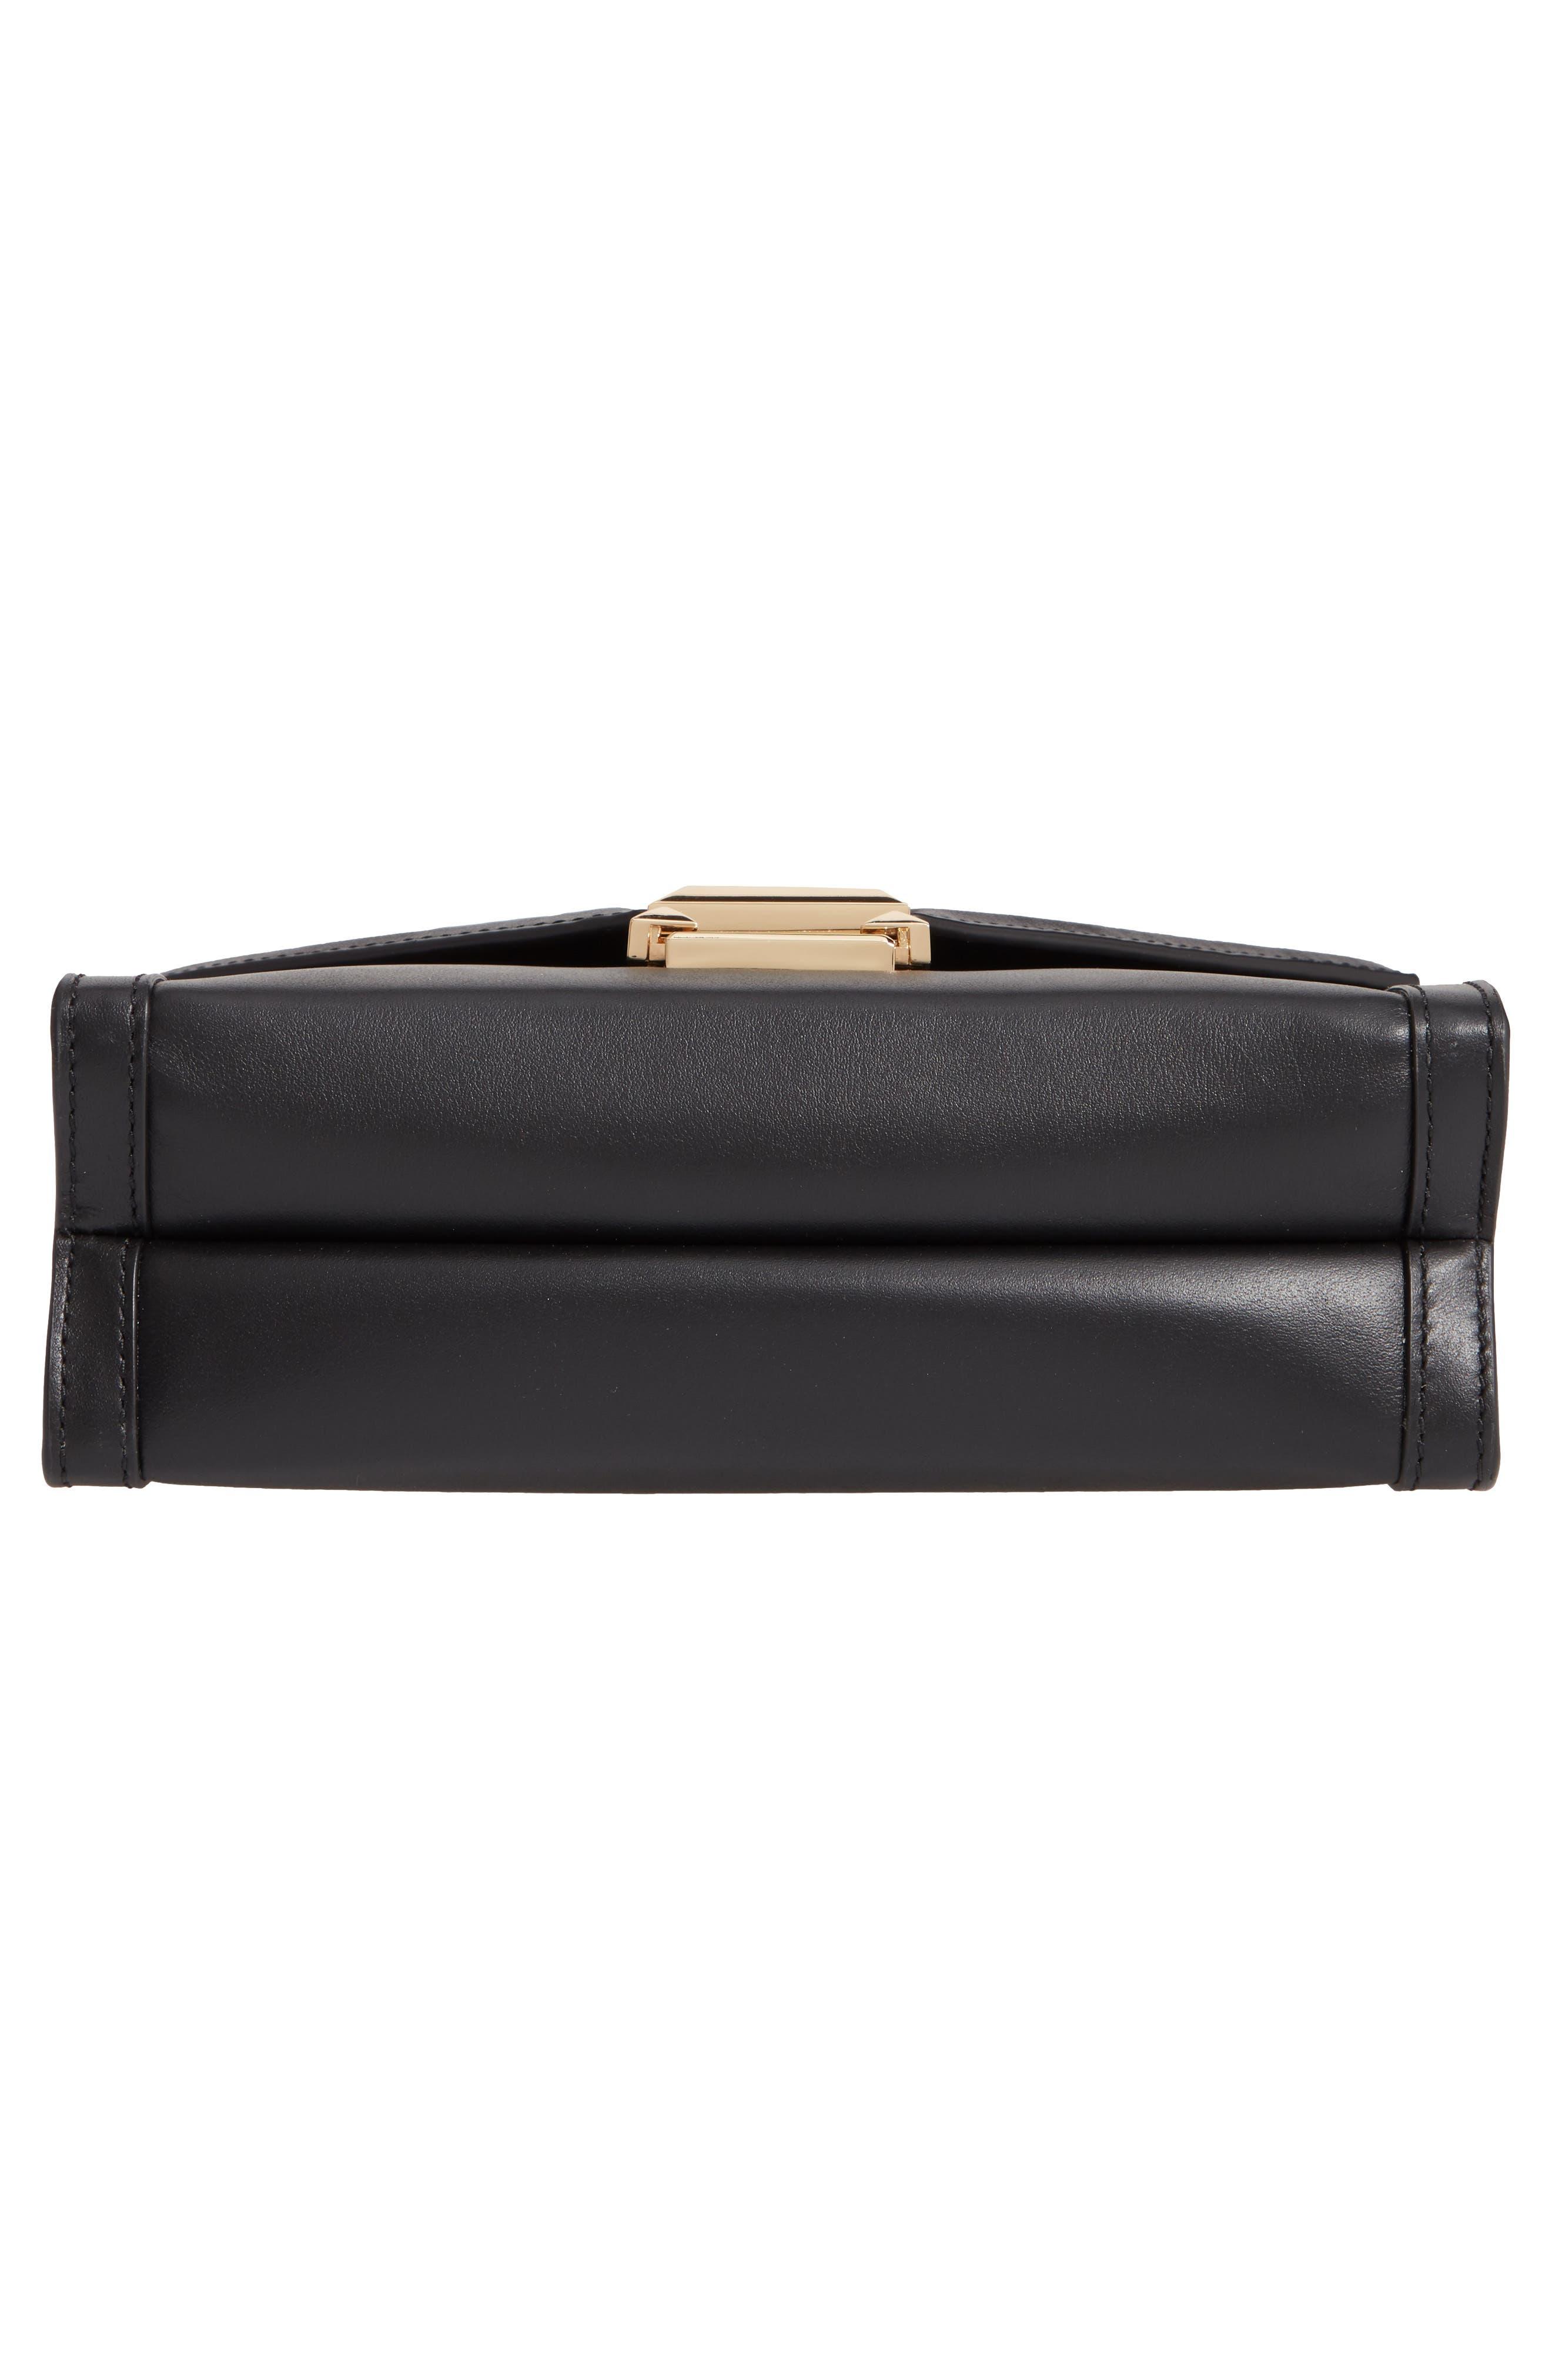 MICHAEL MICHAEL KORS,                             Large Whitney Leather Shoulder Bag,                             Alternate thumbnail 6, color,                             BLACK